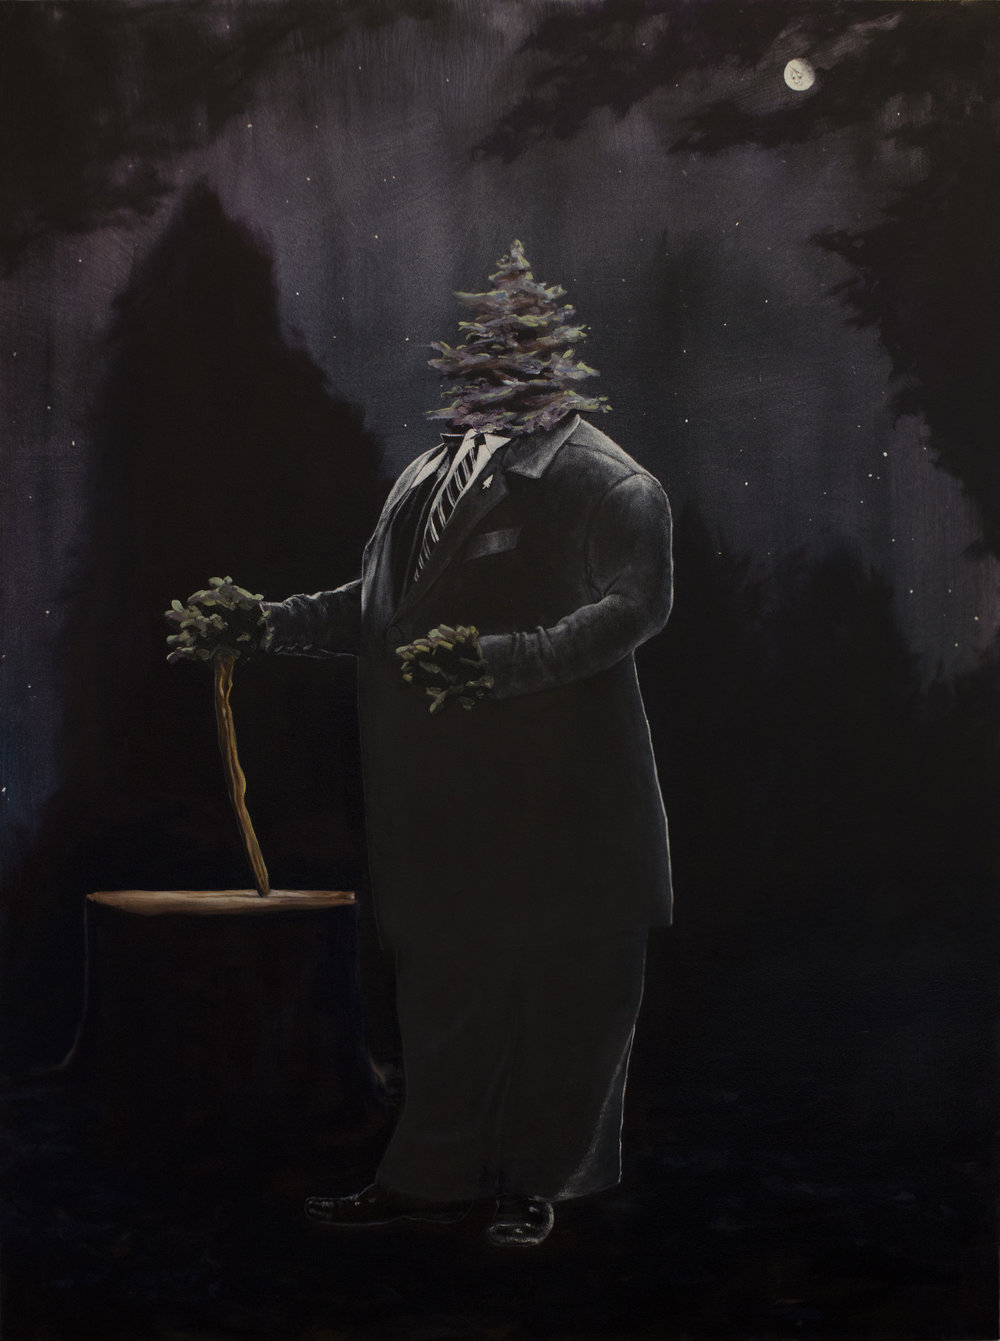 Portrait of Tree XIV